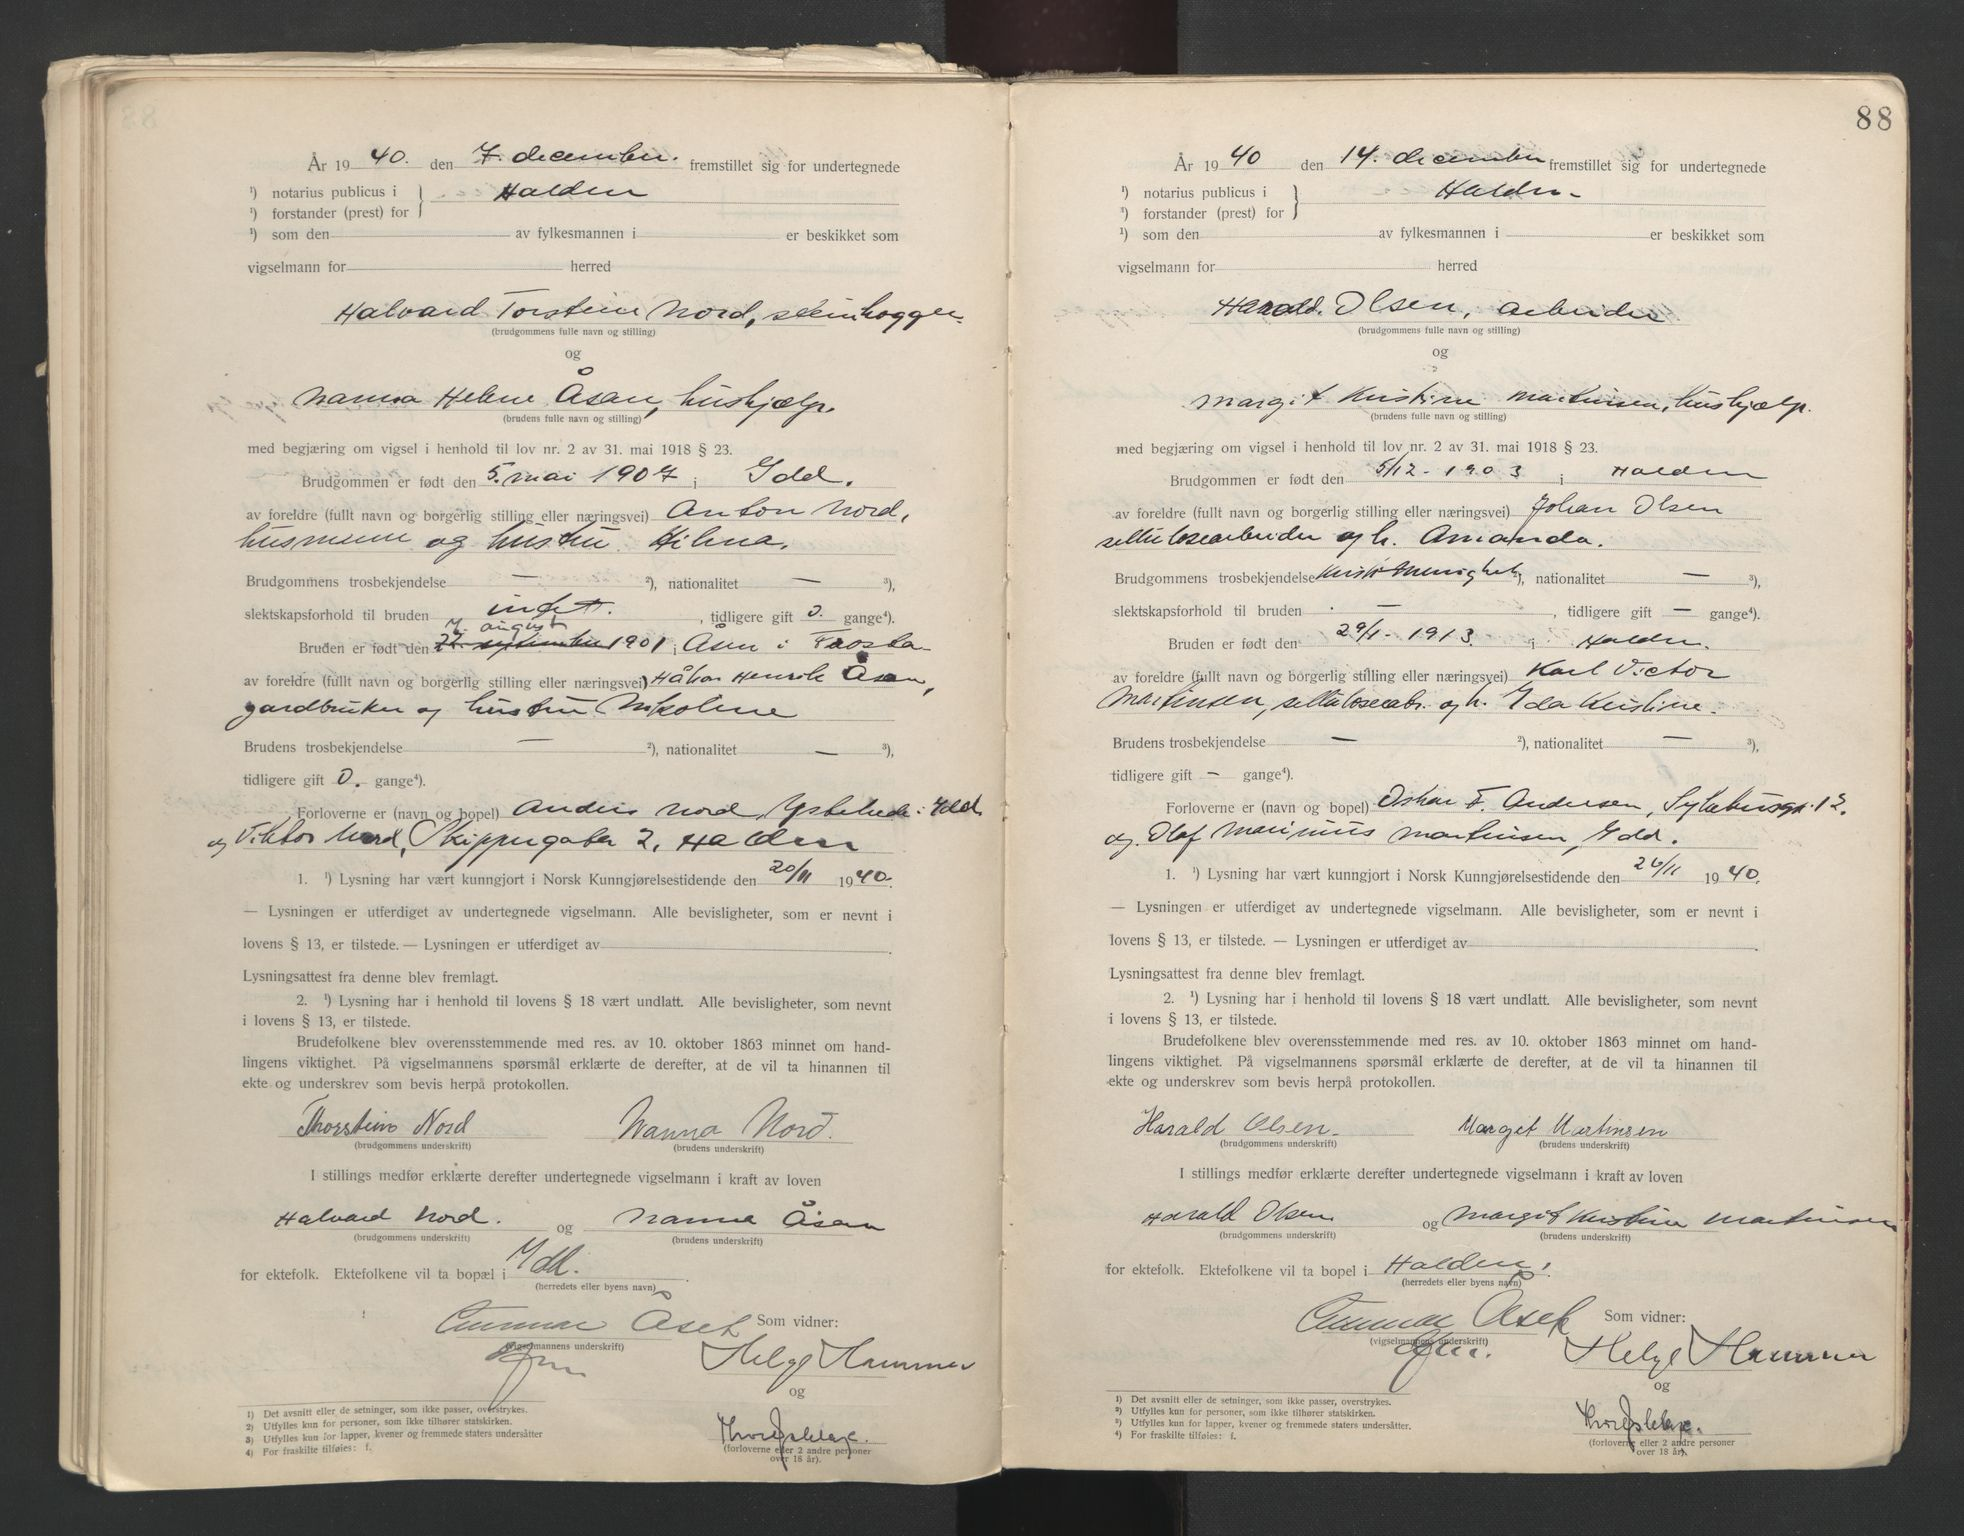 SAO, Idd og Marker sorenskriveri, L/Lc/L0001: Vigselsbøker, 1920-1942, s. 88